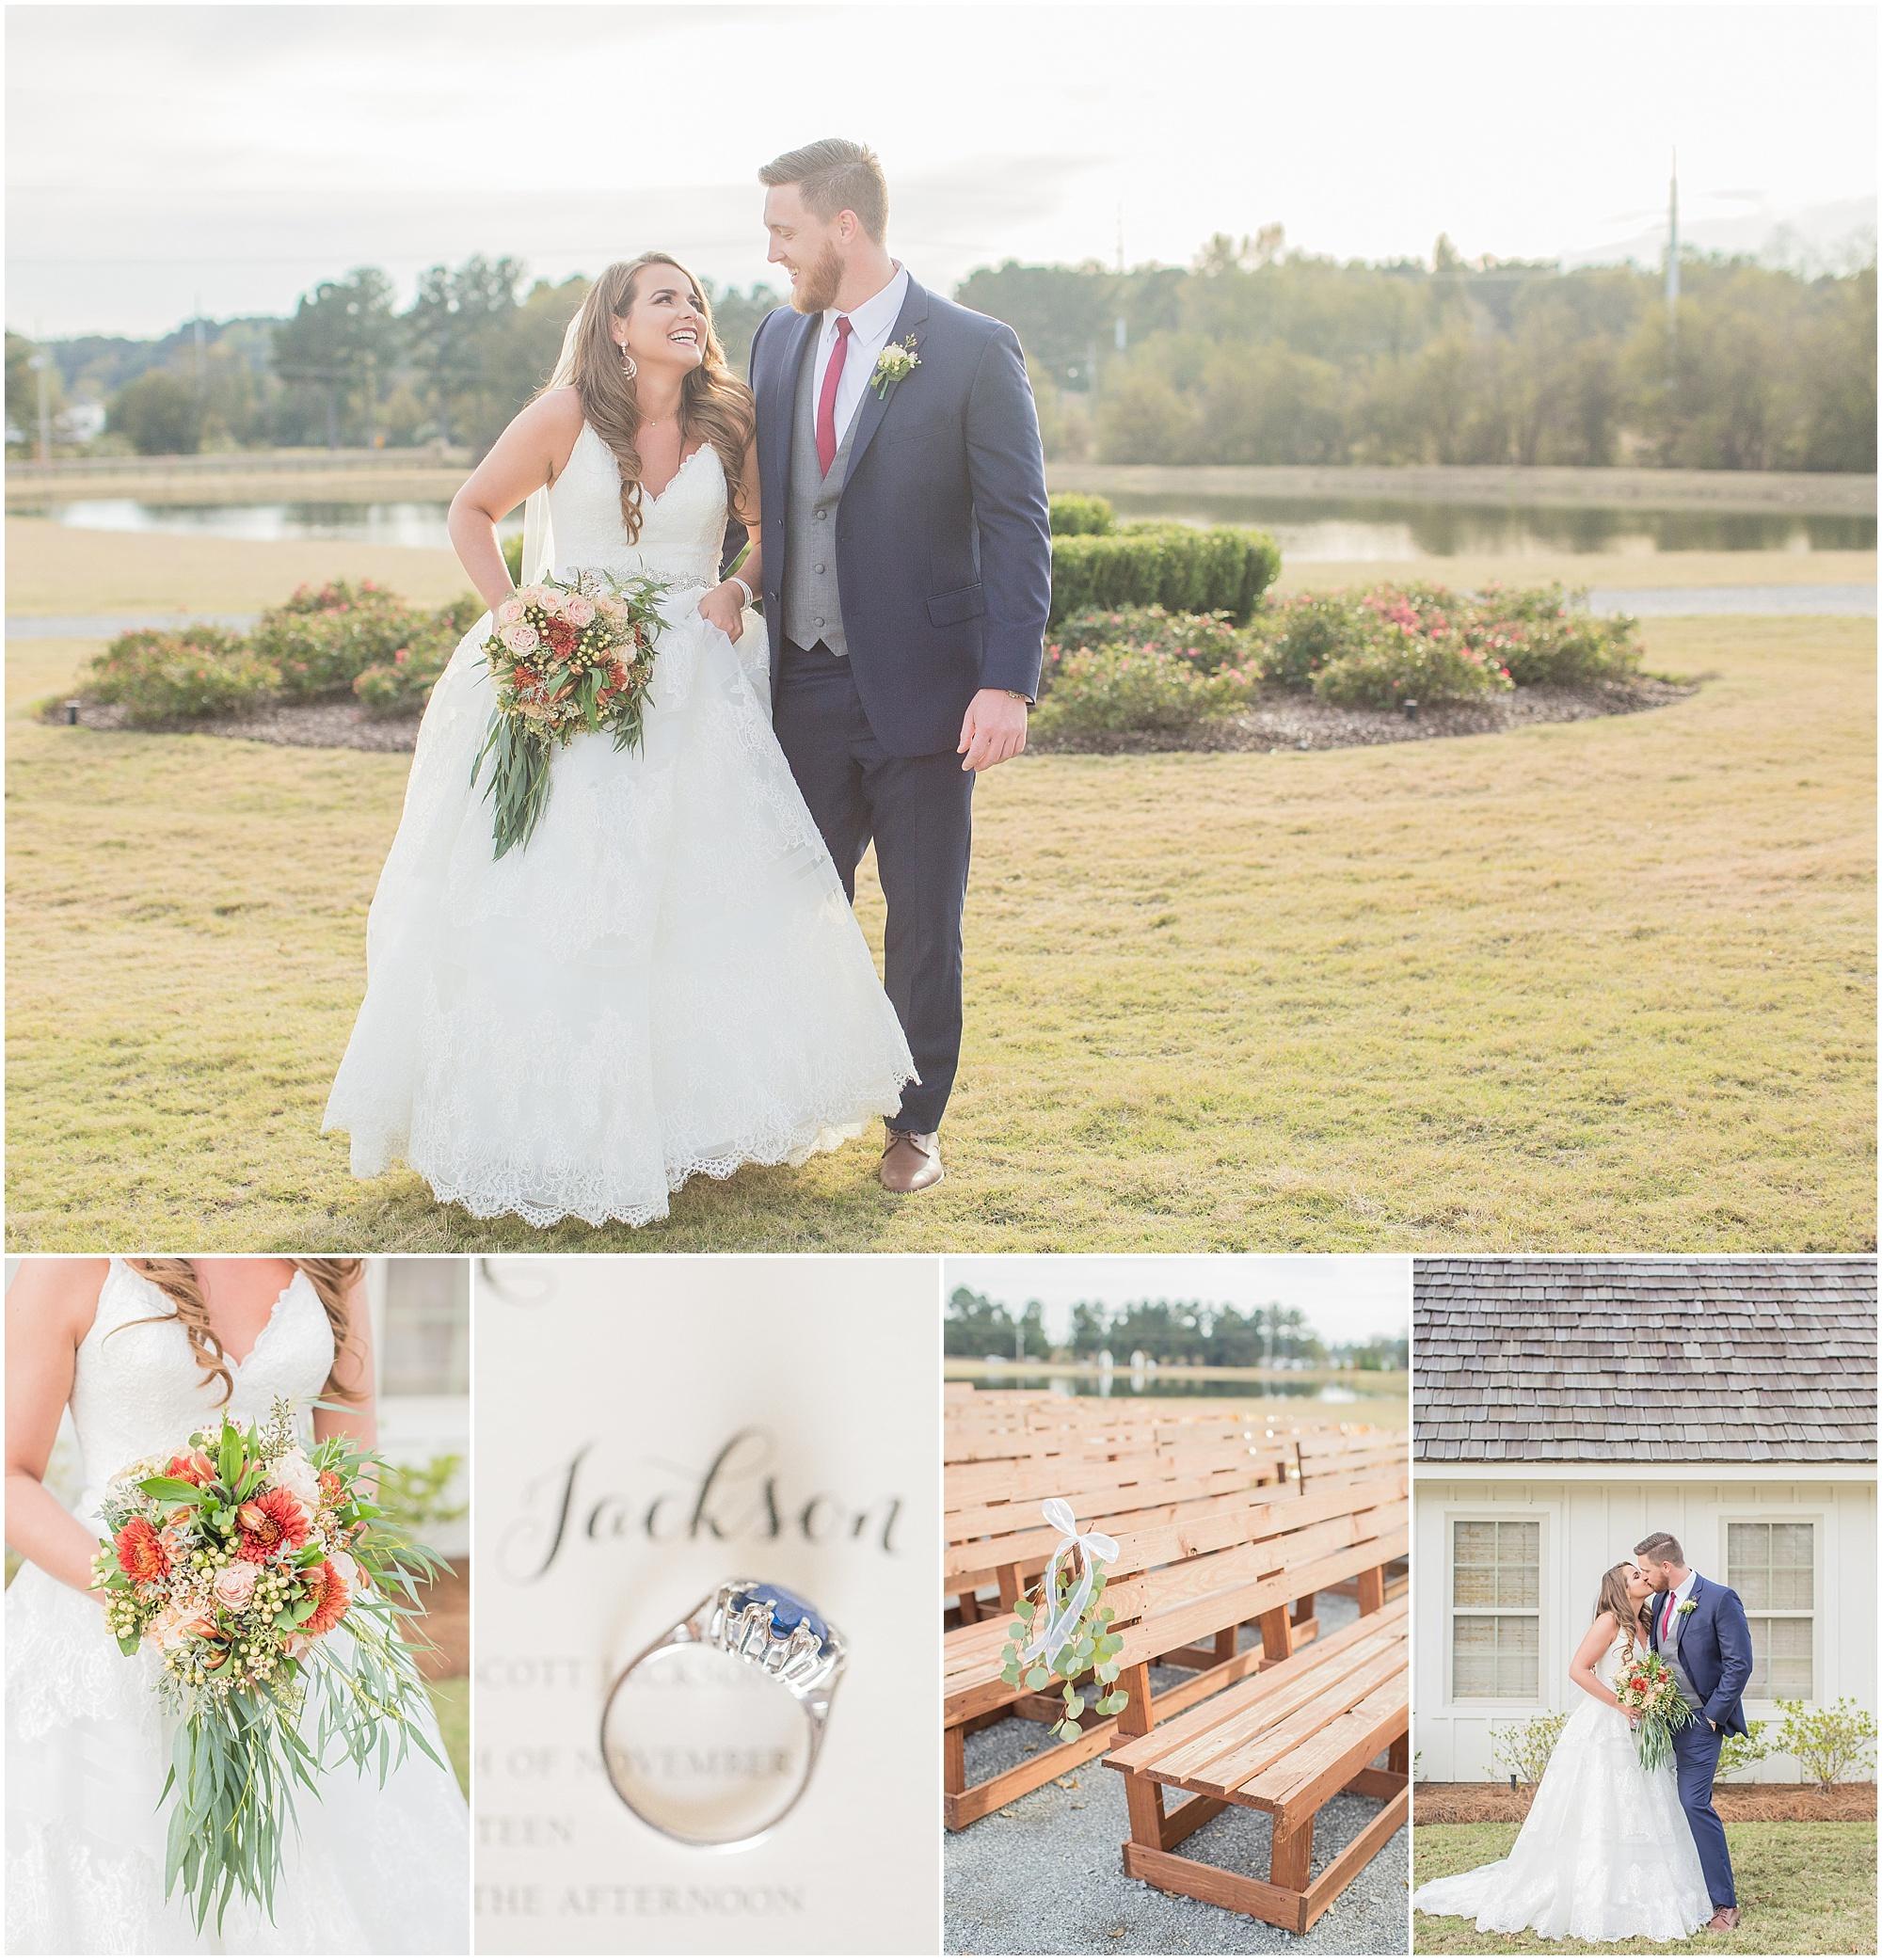 fall-wedding-barn-at-bridlewood-madison-mississippi_0001.jpg